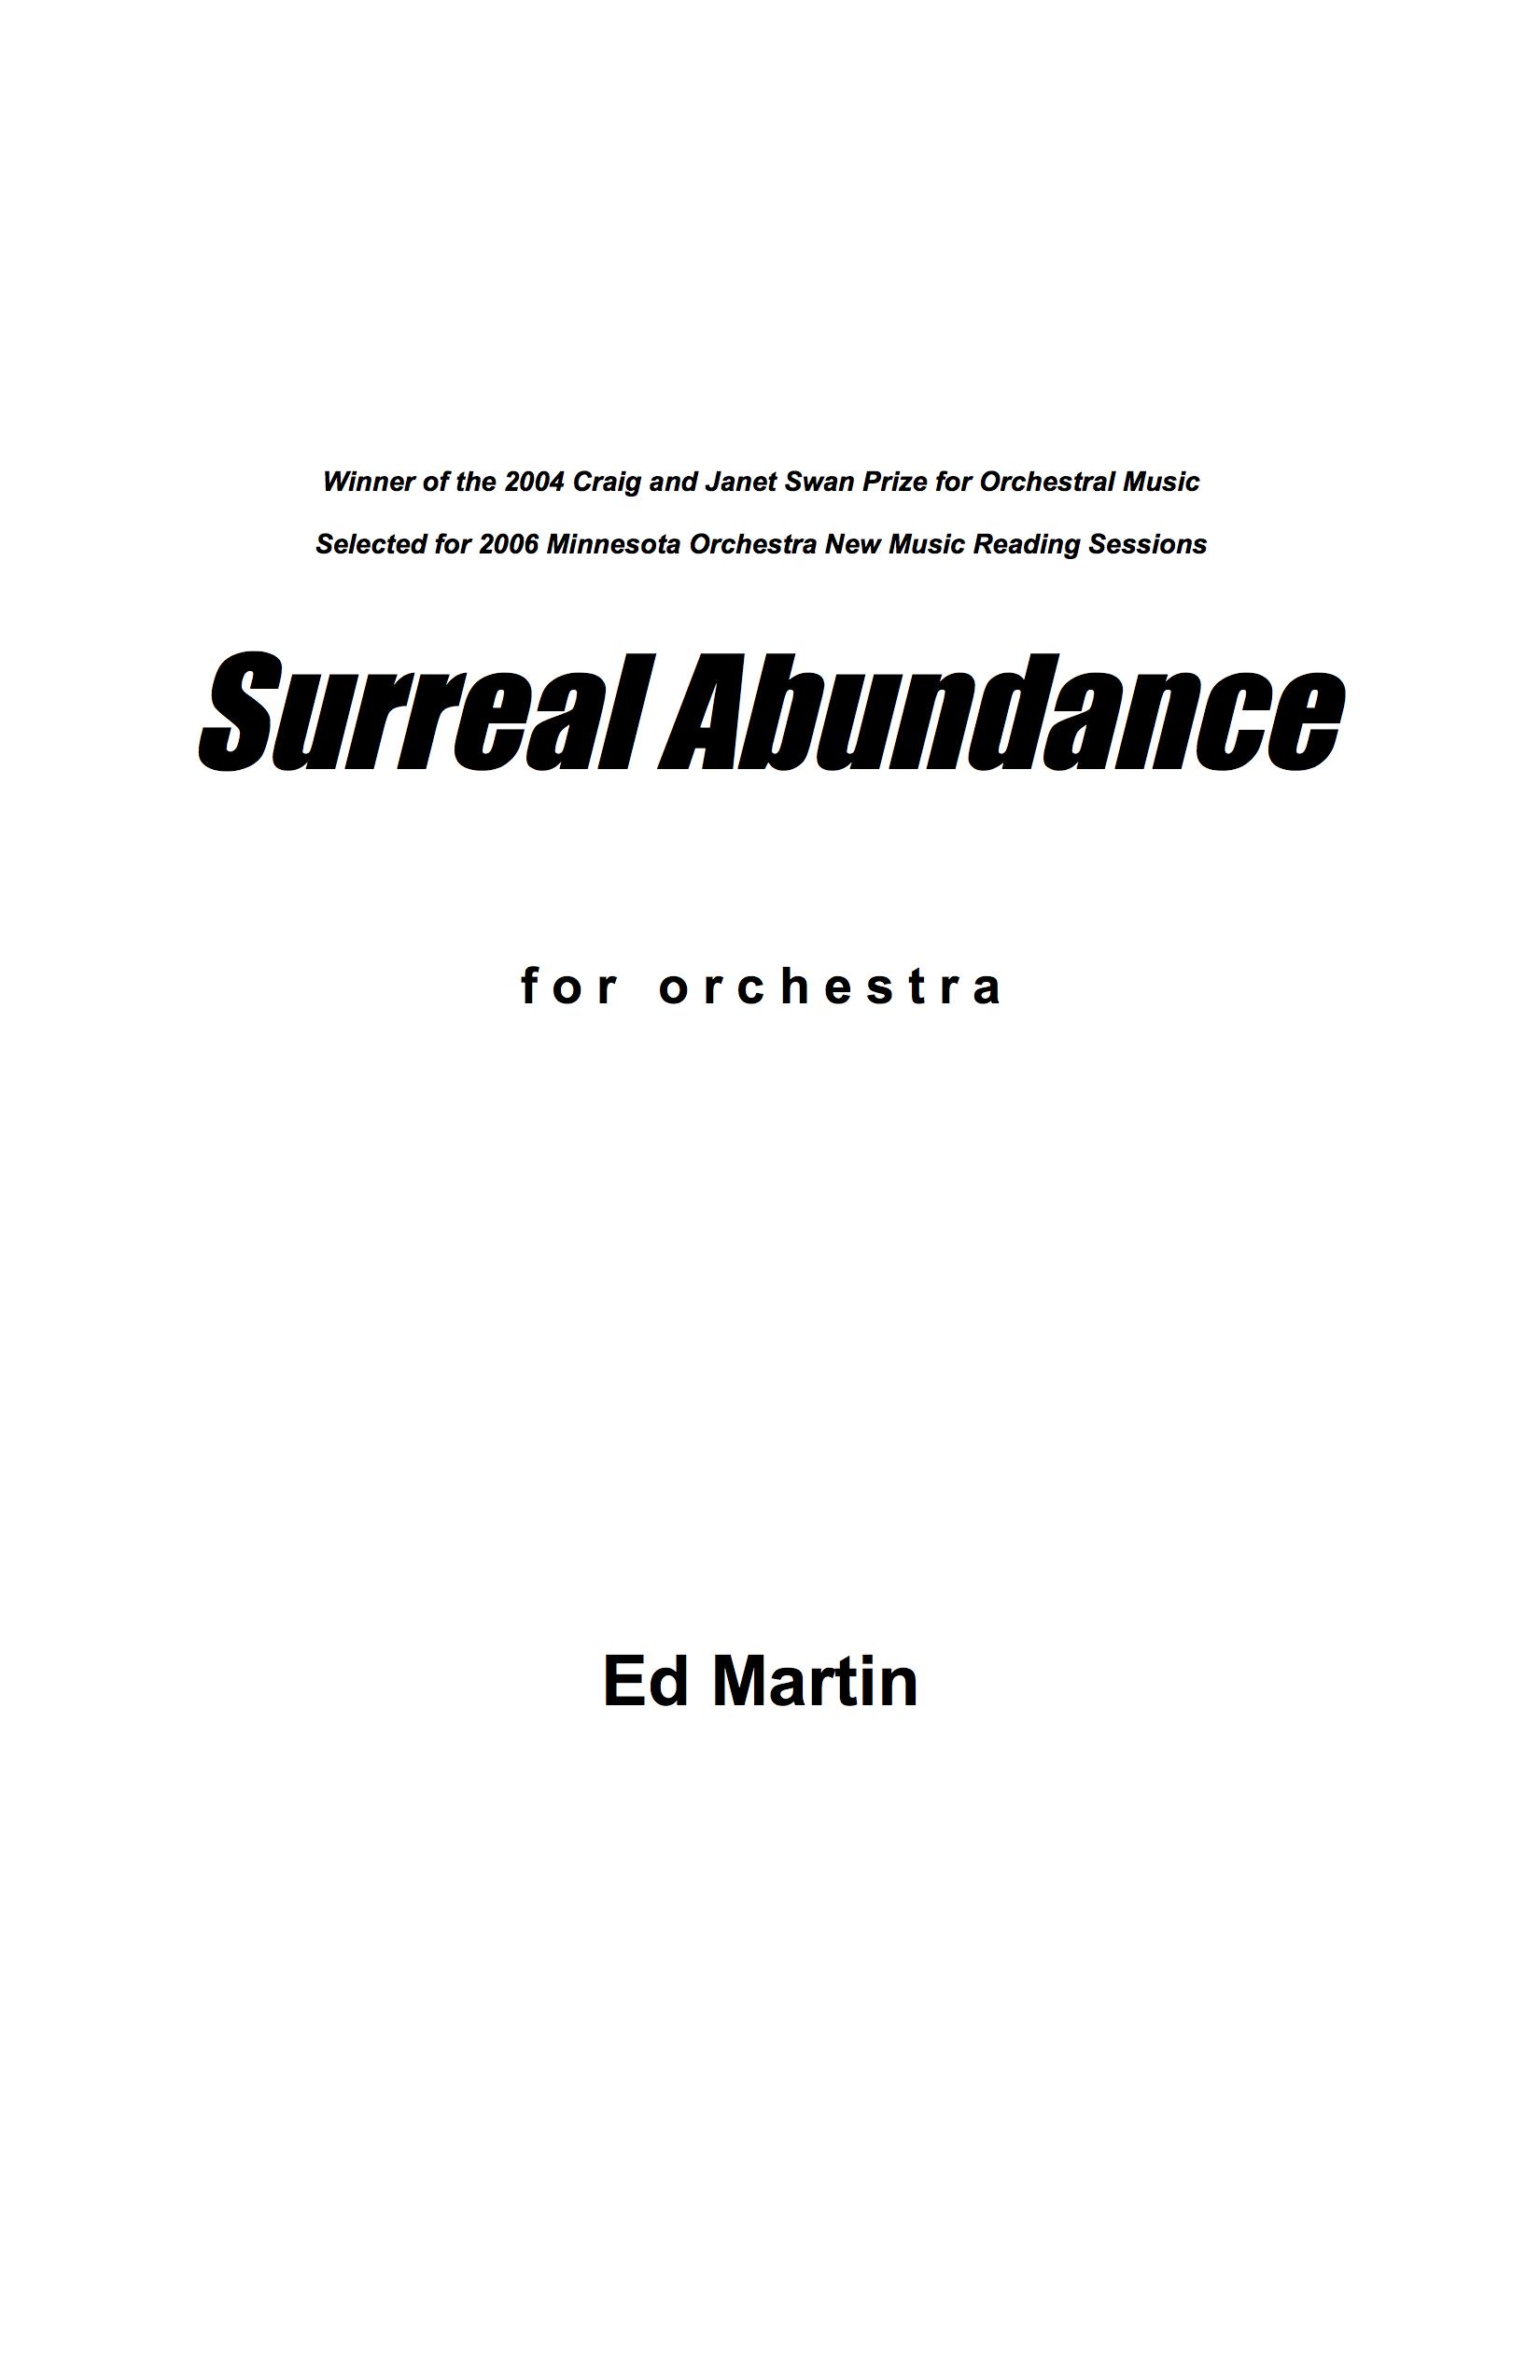 Surreal Abundance_Orch_3 perc_2_10_06.jpg